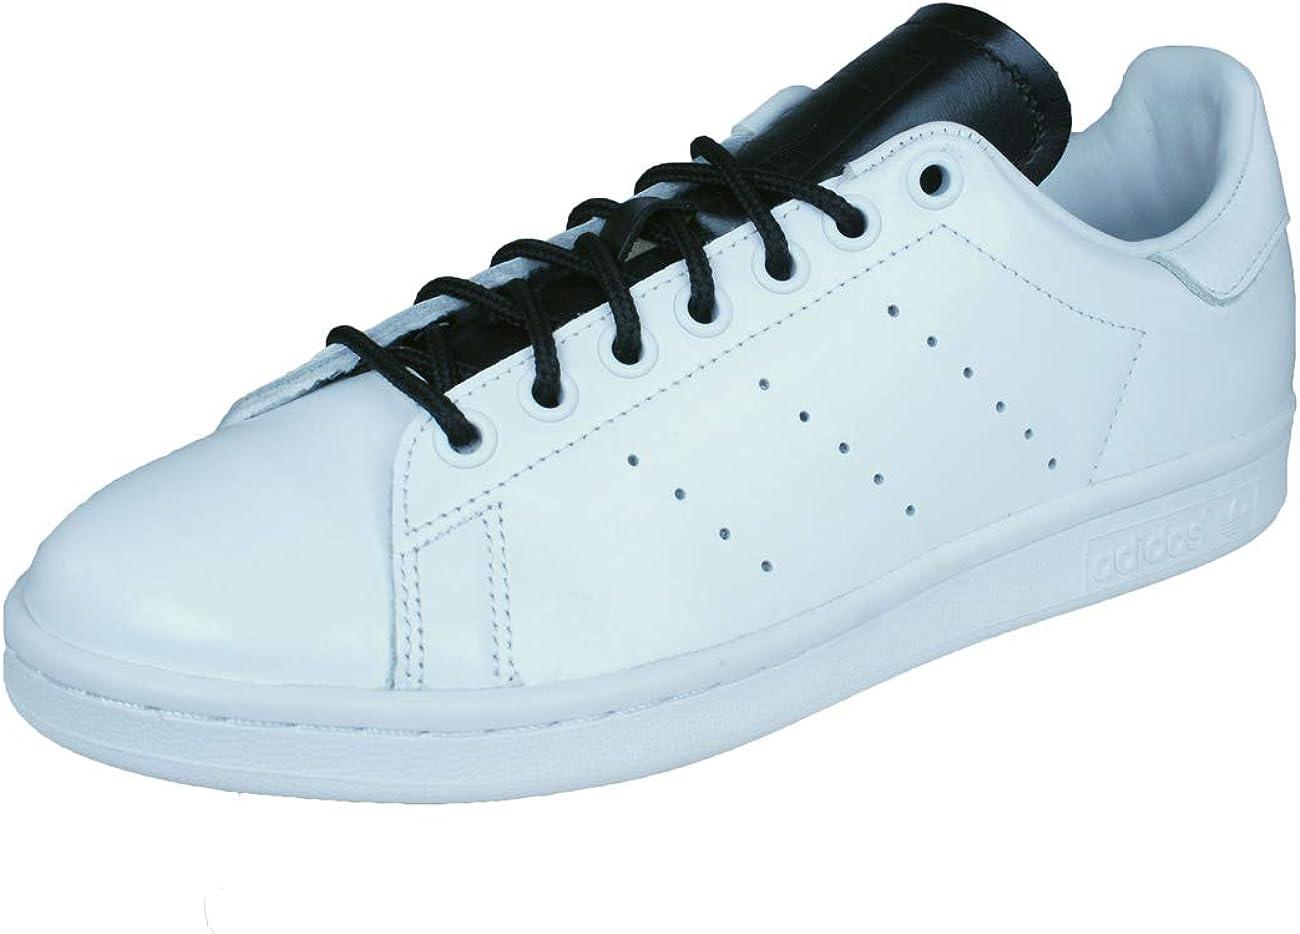 adidas Originals Stan Smith Men's